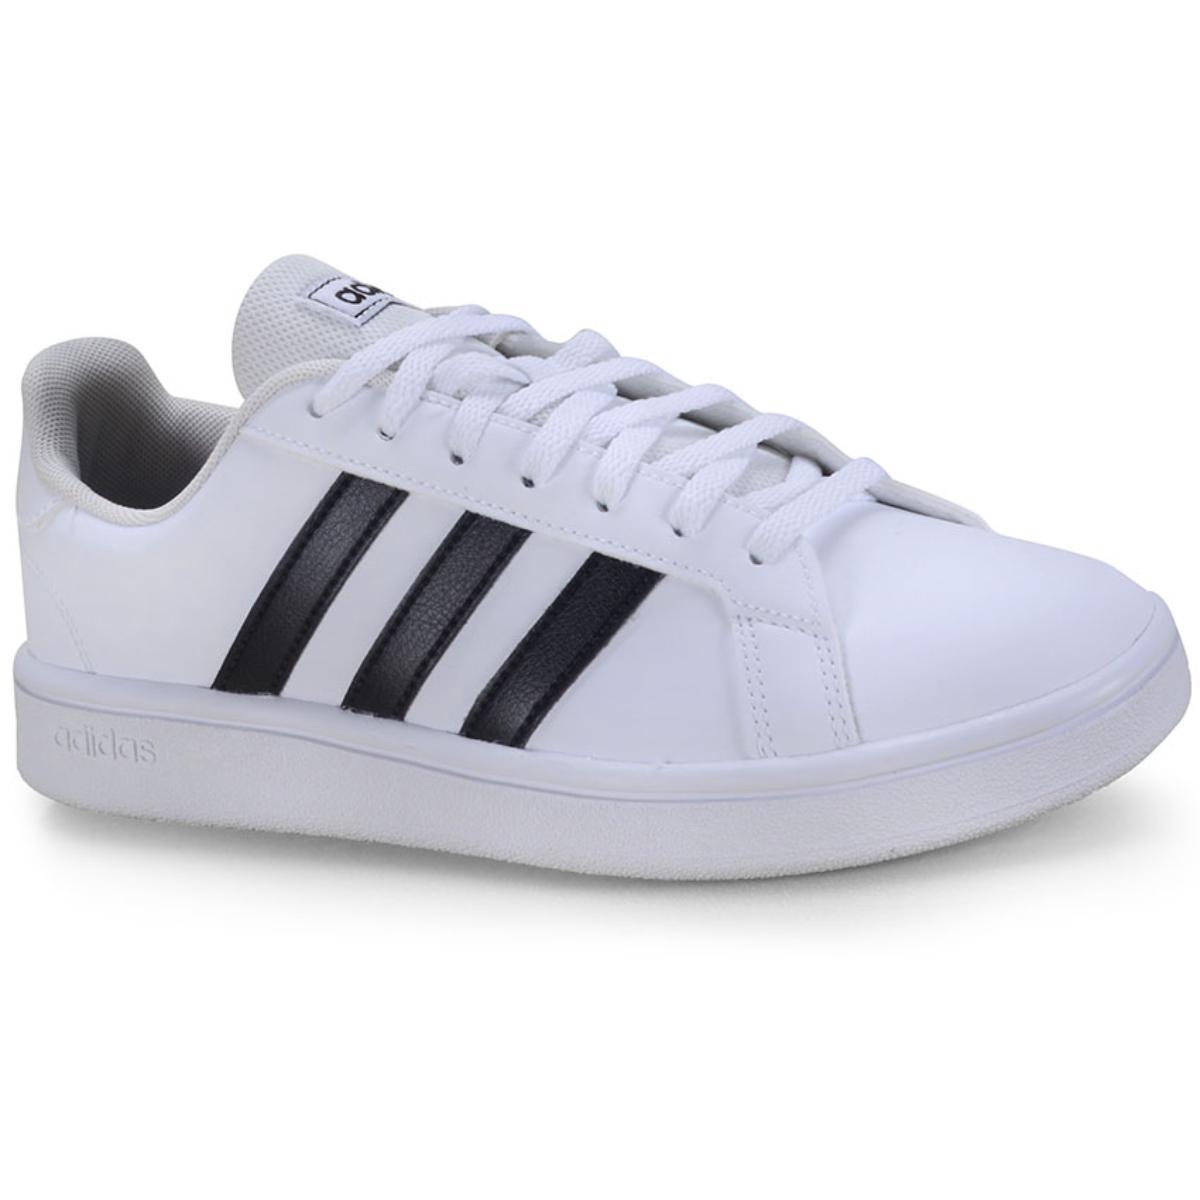 Tênis Feminino Adidas Ee7968 Grand Court Base w Branco/preto